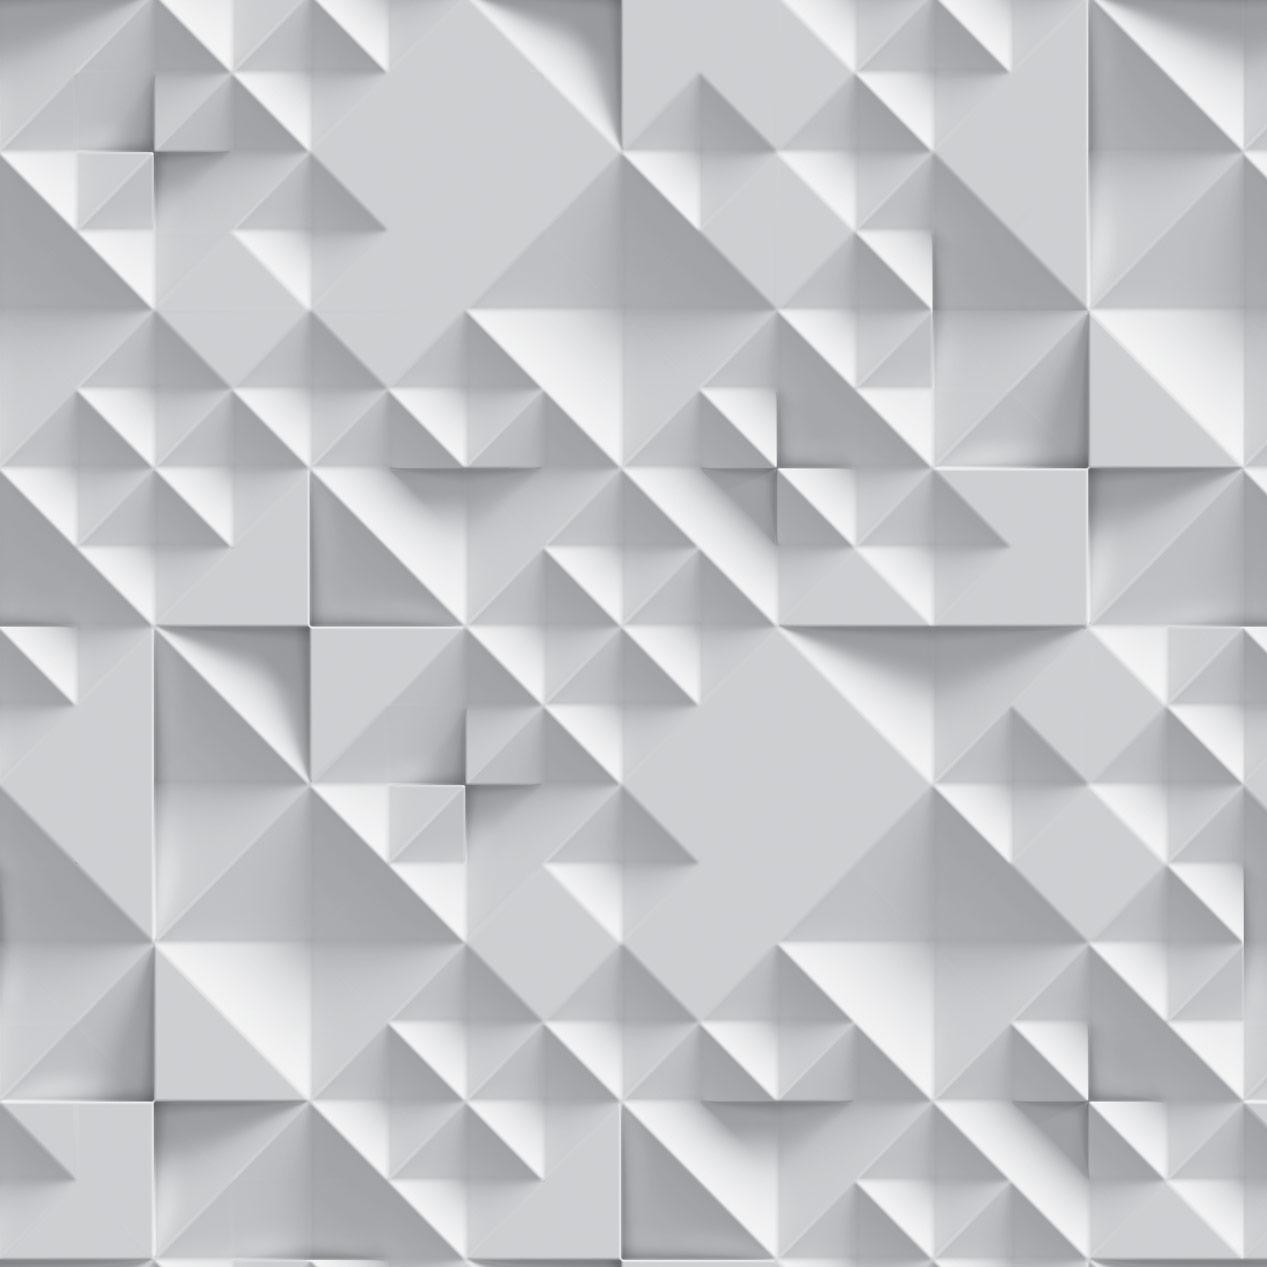 Papel de Parede Geométrico Estilo 3D Branco Gelo